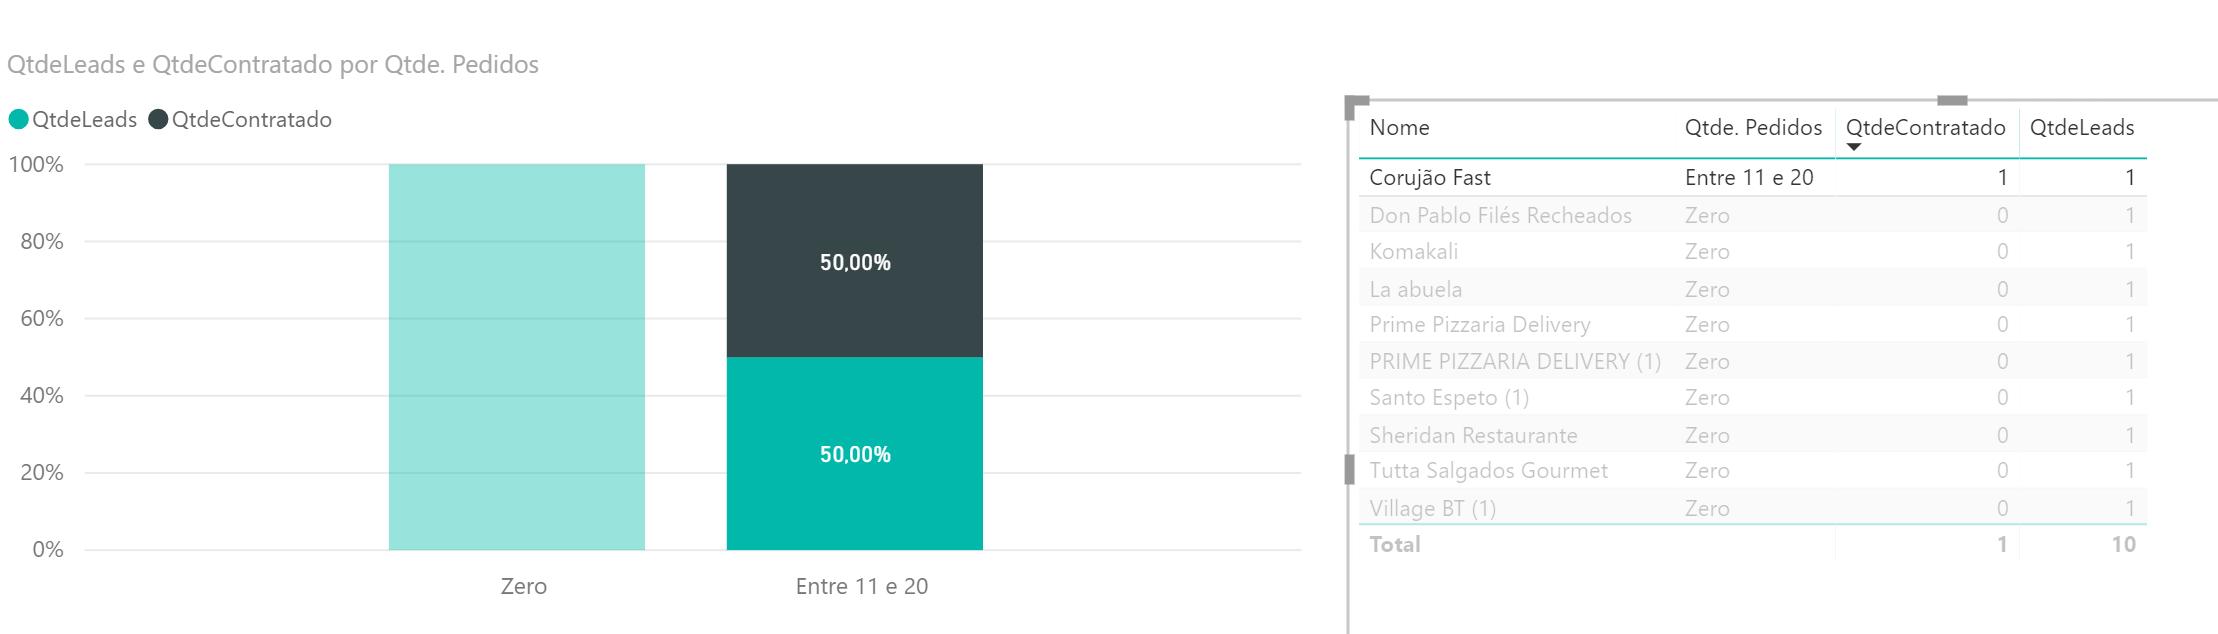 stacked bar chart never goes above 50% - Microsoft Power BI Community